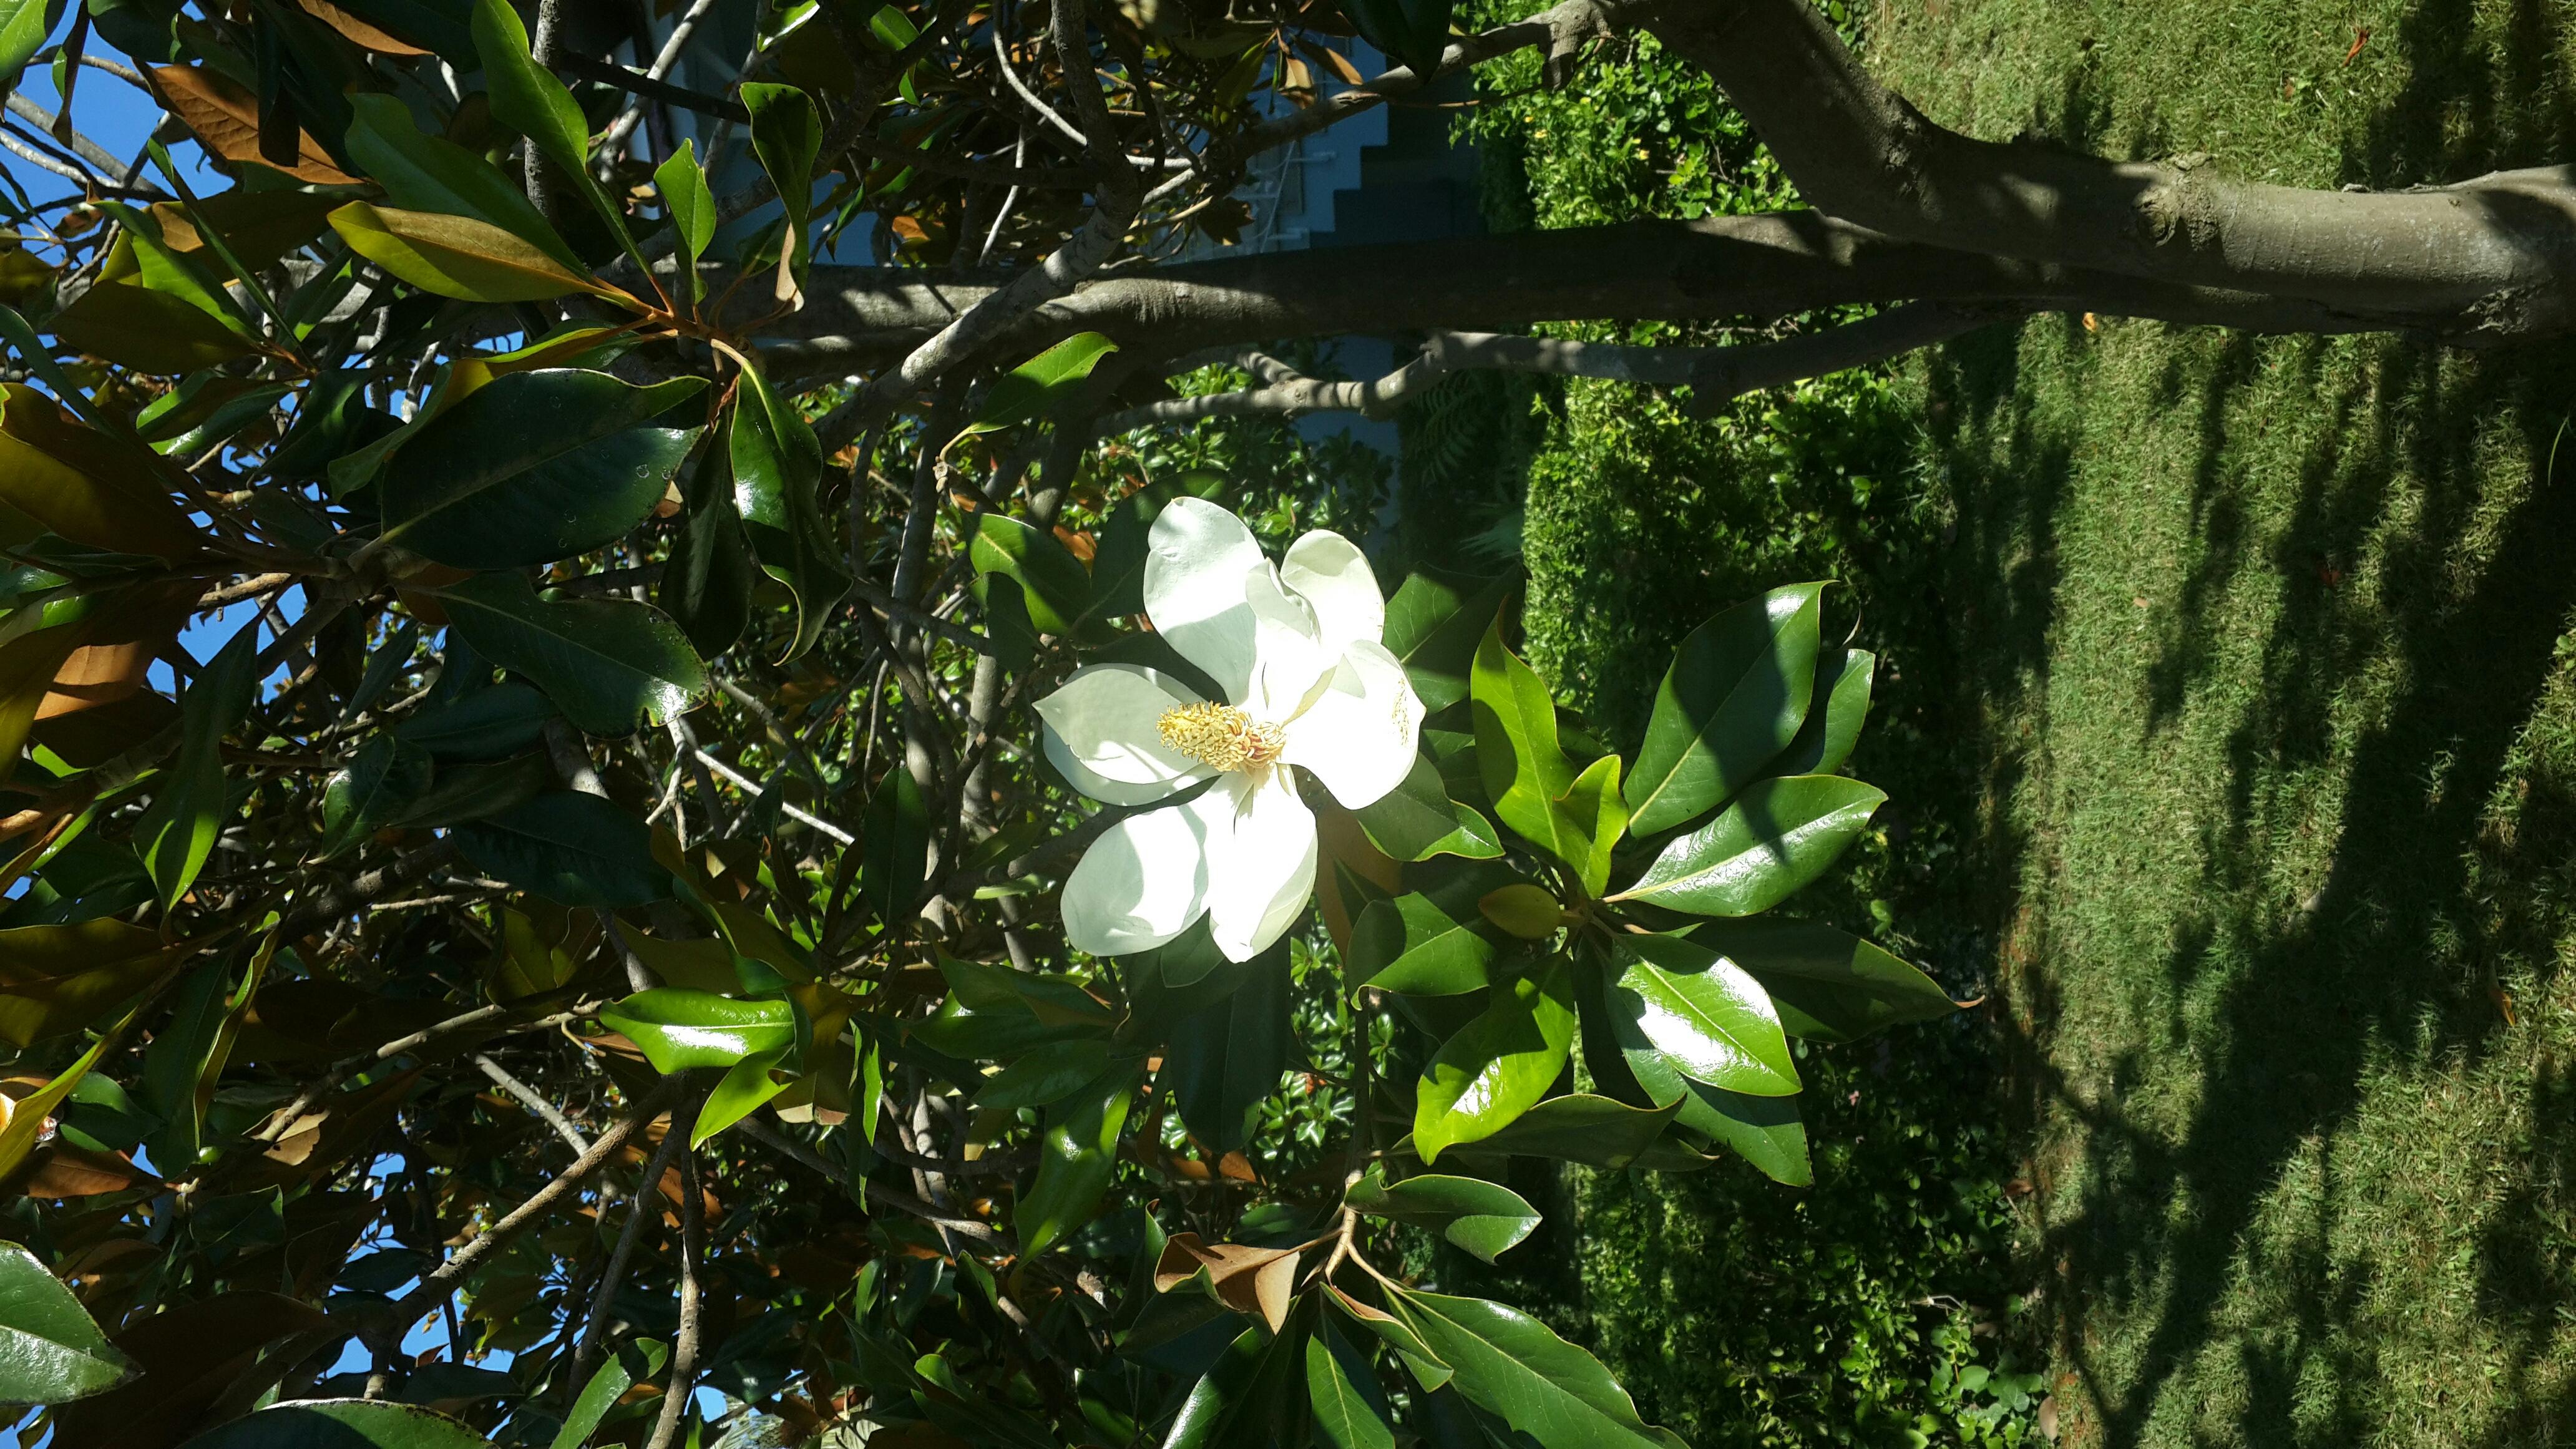 Растения сочи фото с названиями и описанием